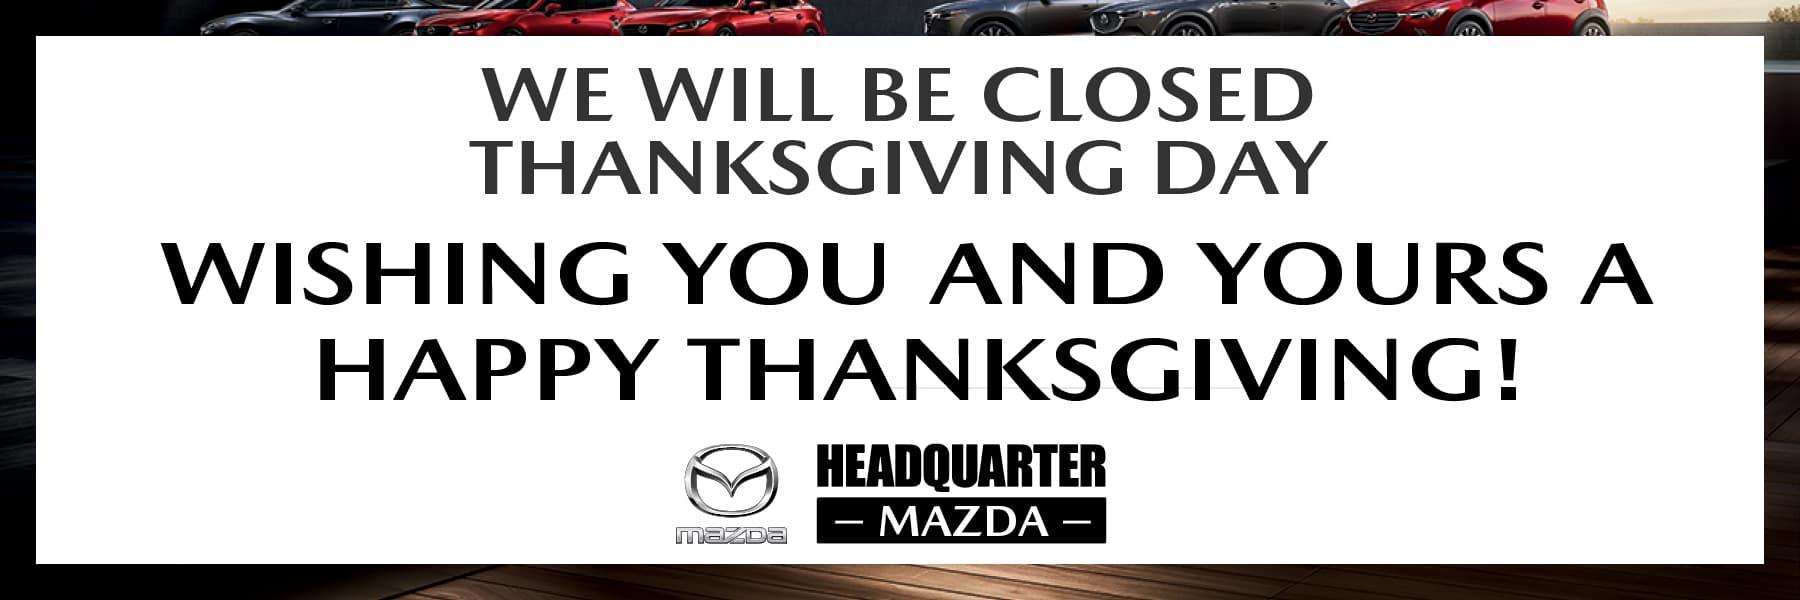 hqmazdatdayT3963_ HQ Mazda Thanks 1800X600